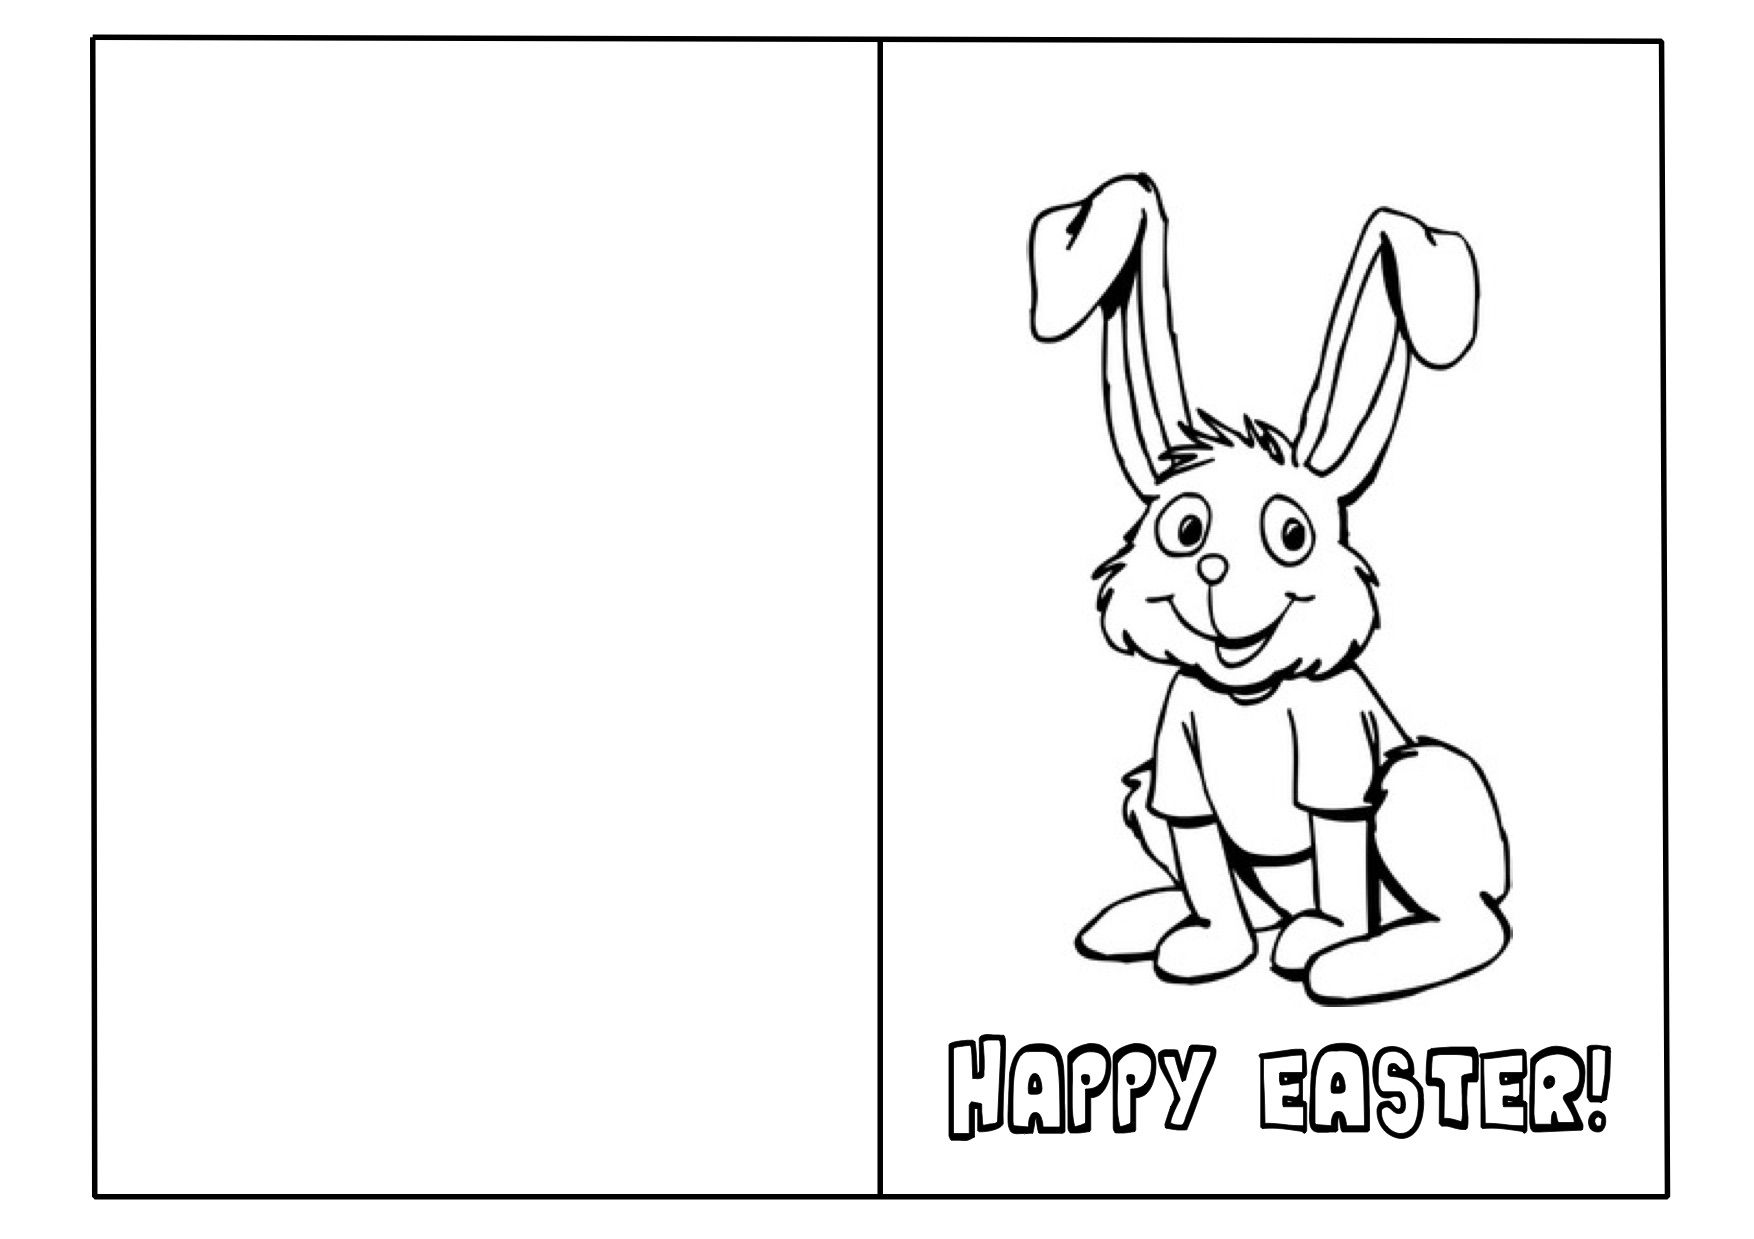 Easter Card Template Ks2 1